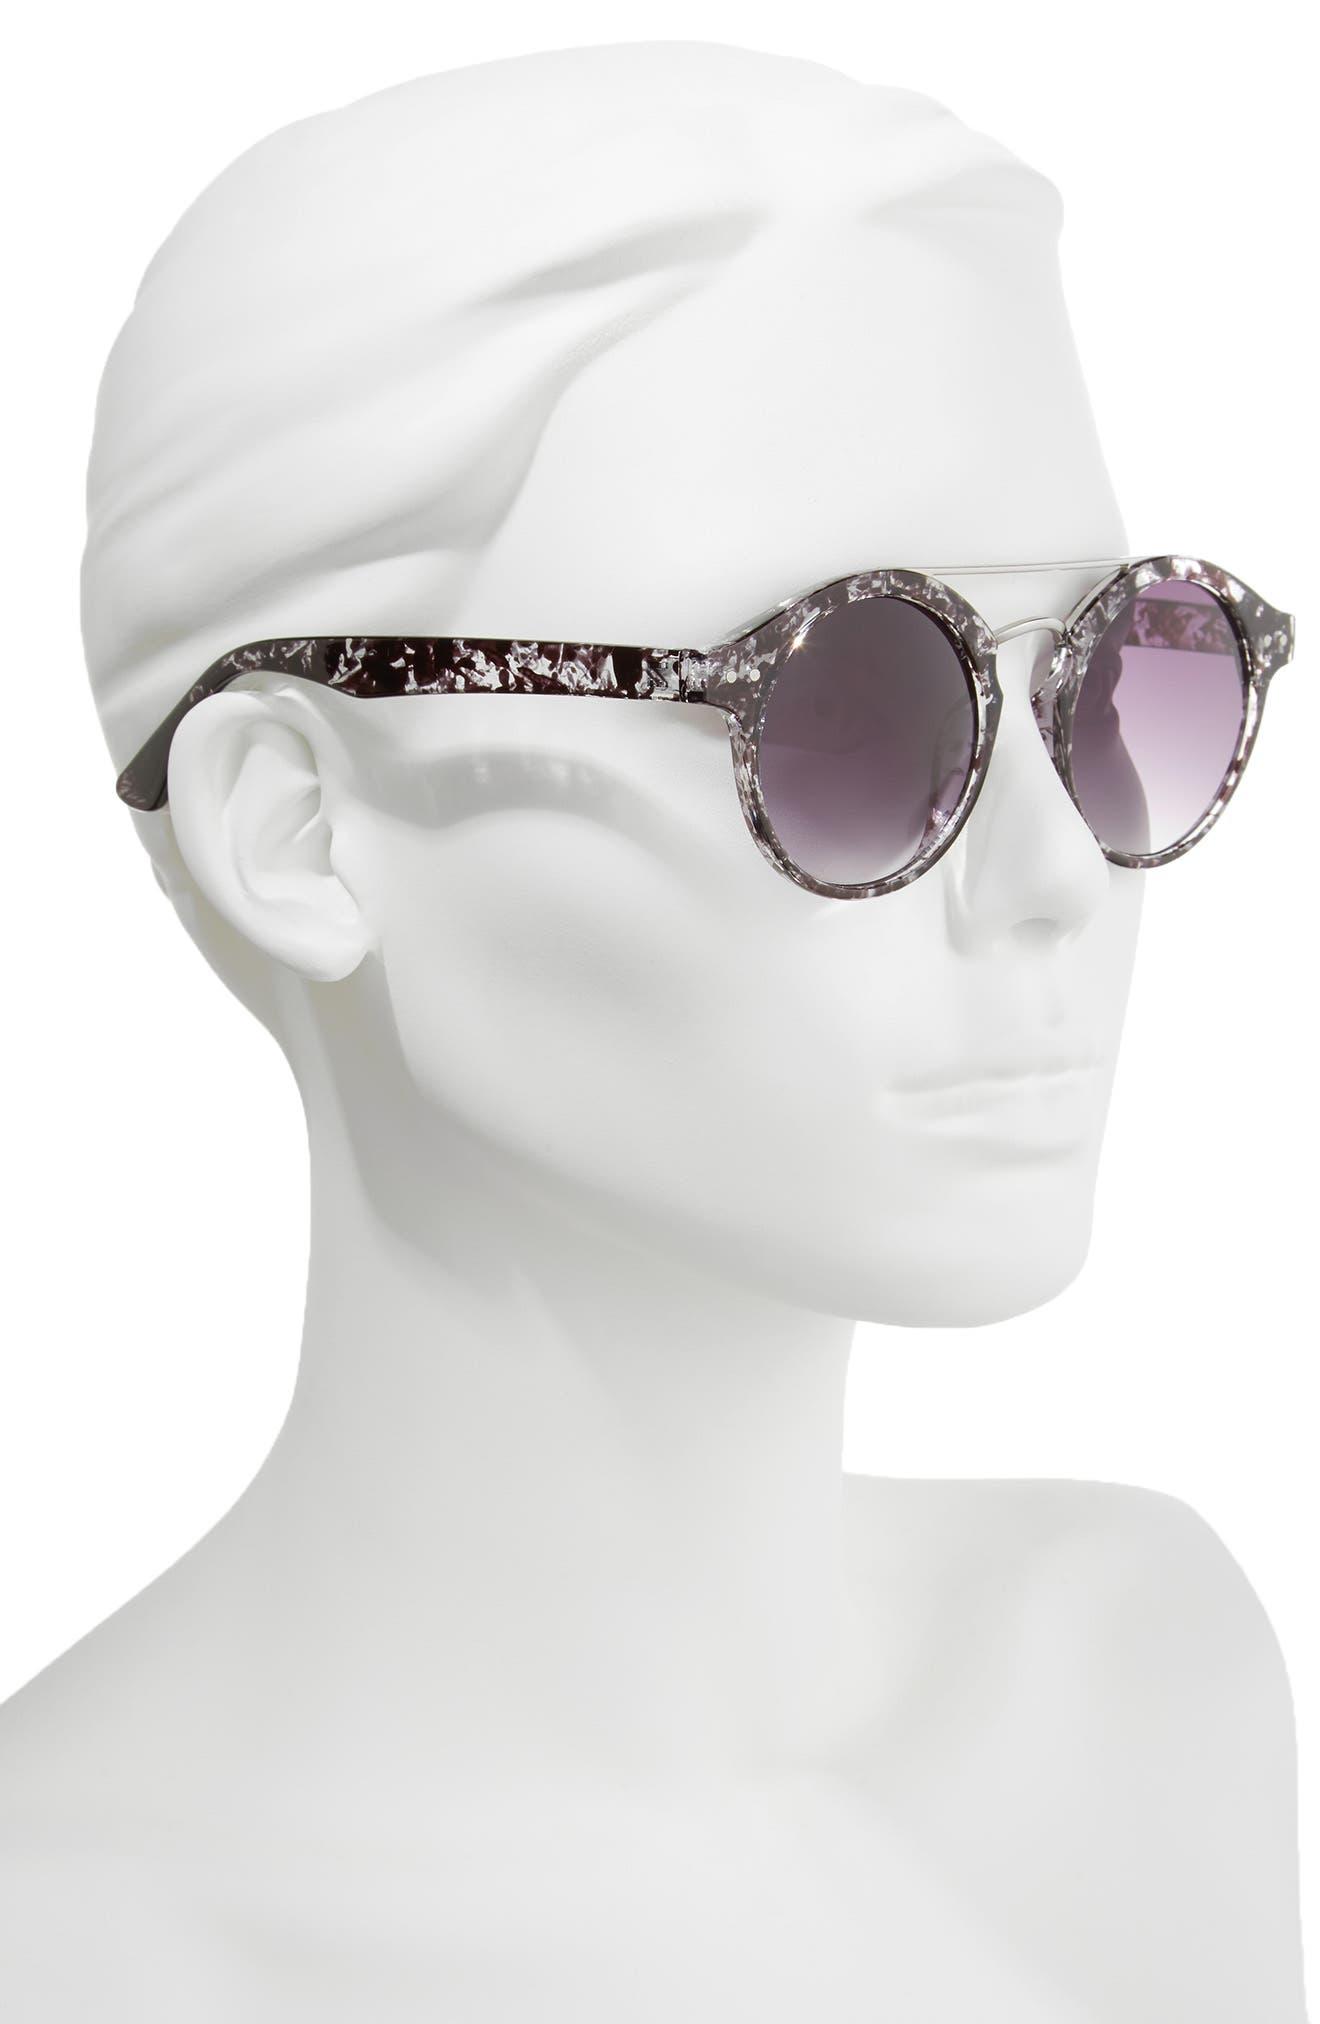 45mm Round Sunglasses,                             Alternate thumbnail 2, color,                             001